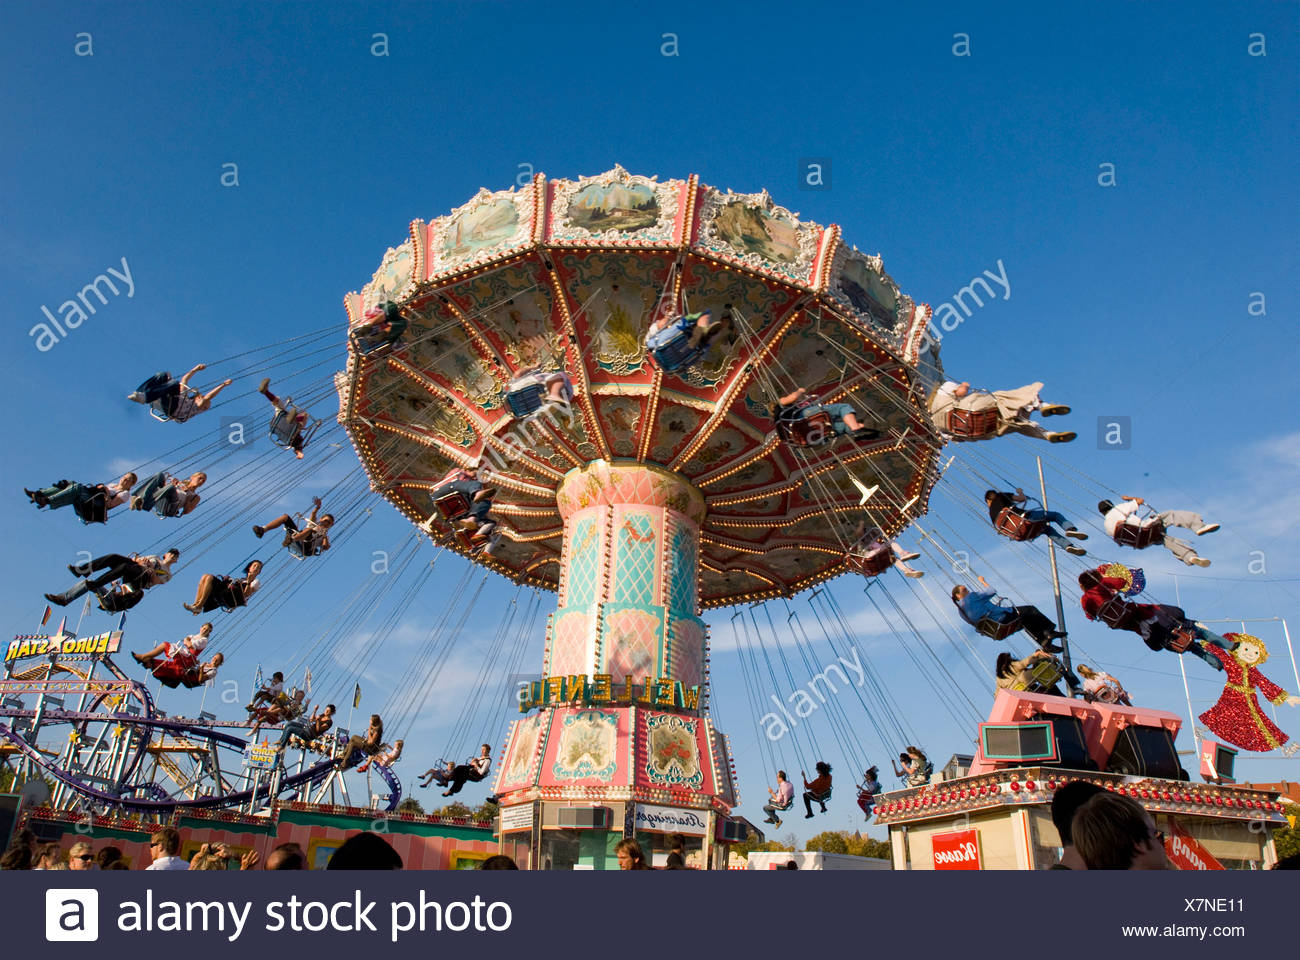 Carousel, Octoberfest, Munich, Bavaria, Germany - Stock Image